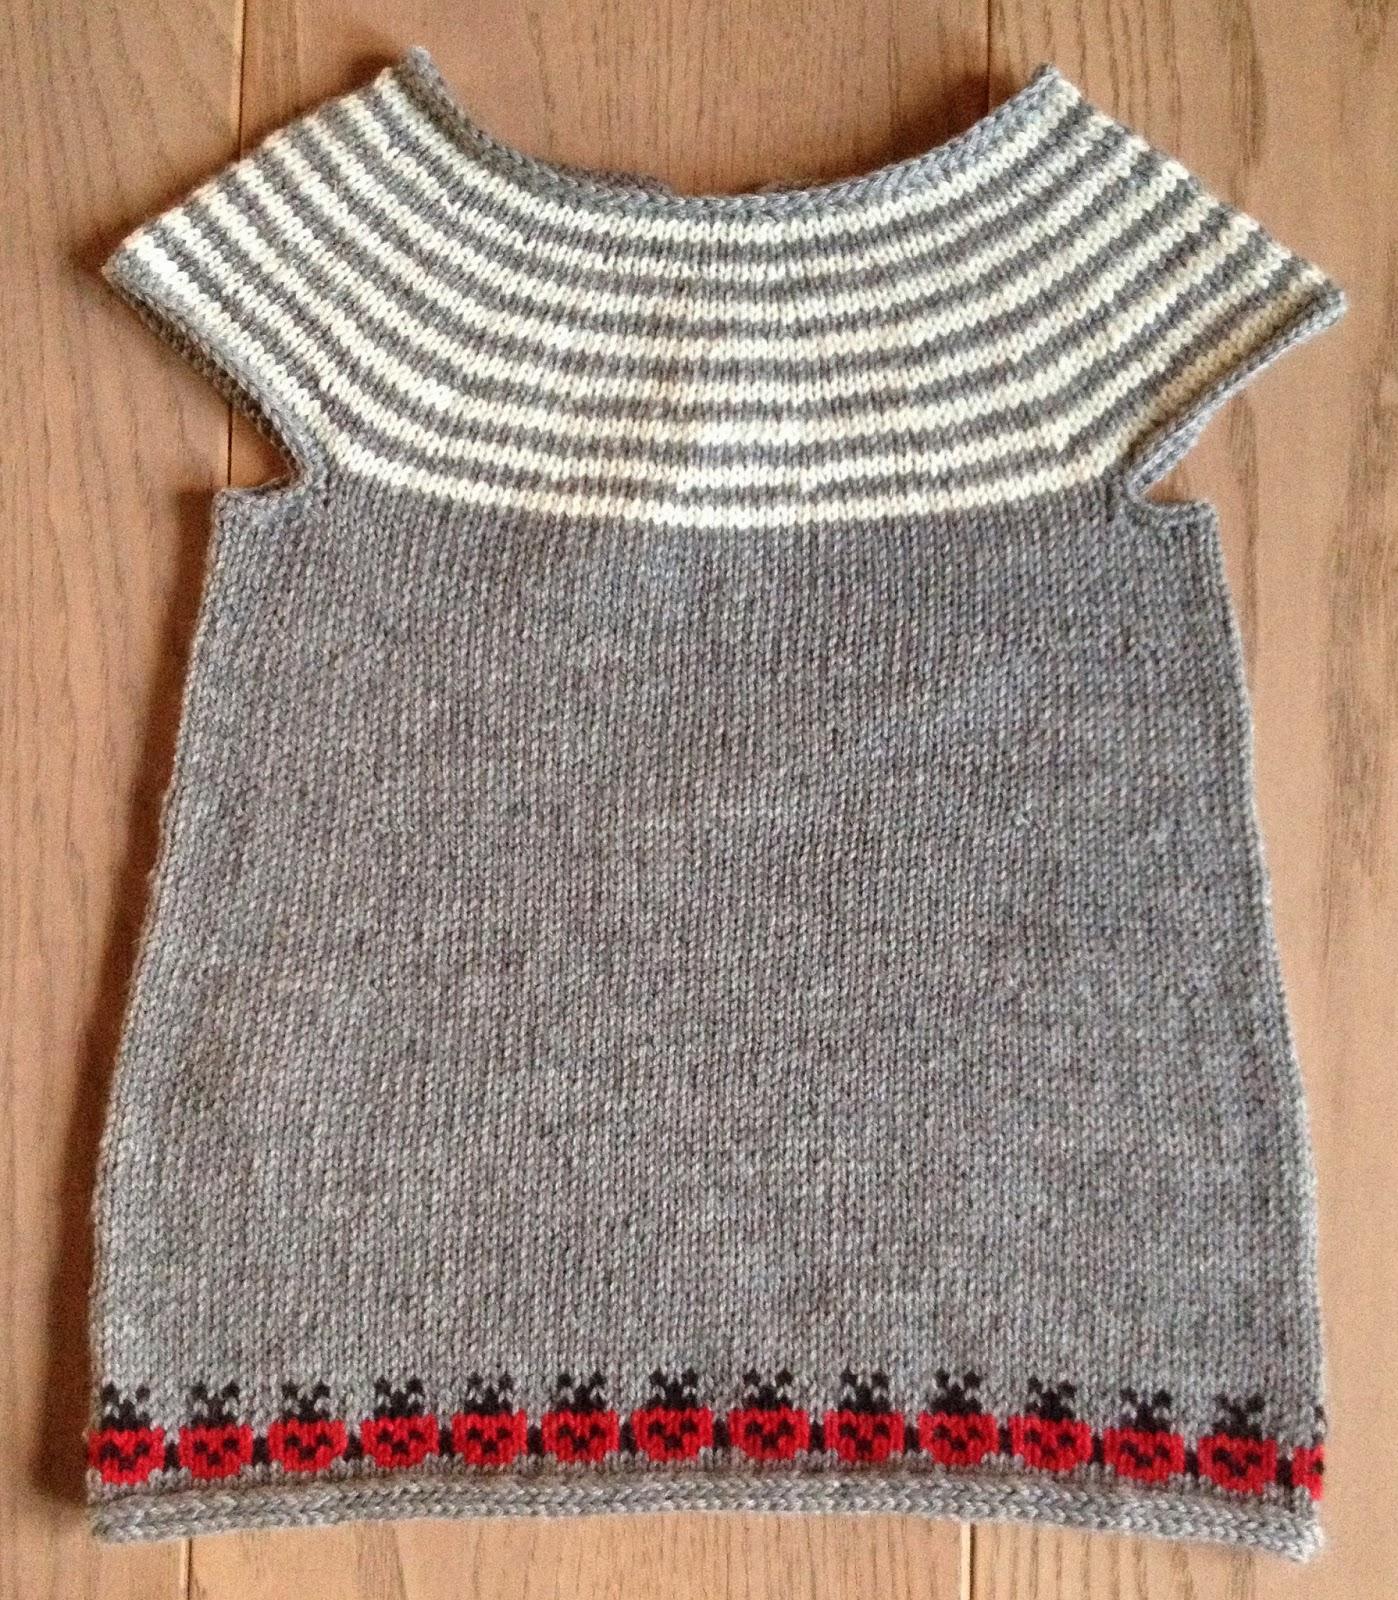 strikket tunika til baby